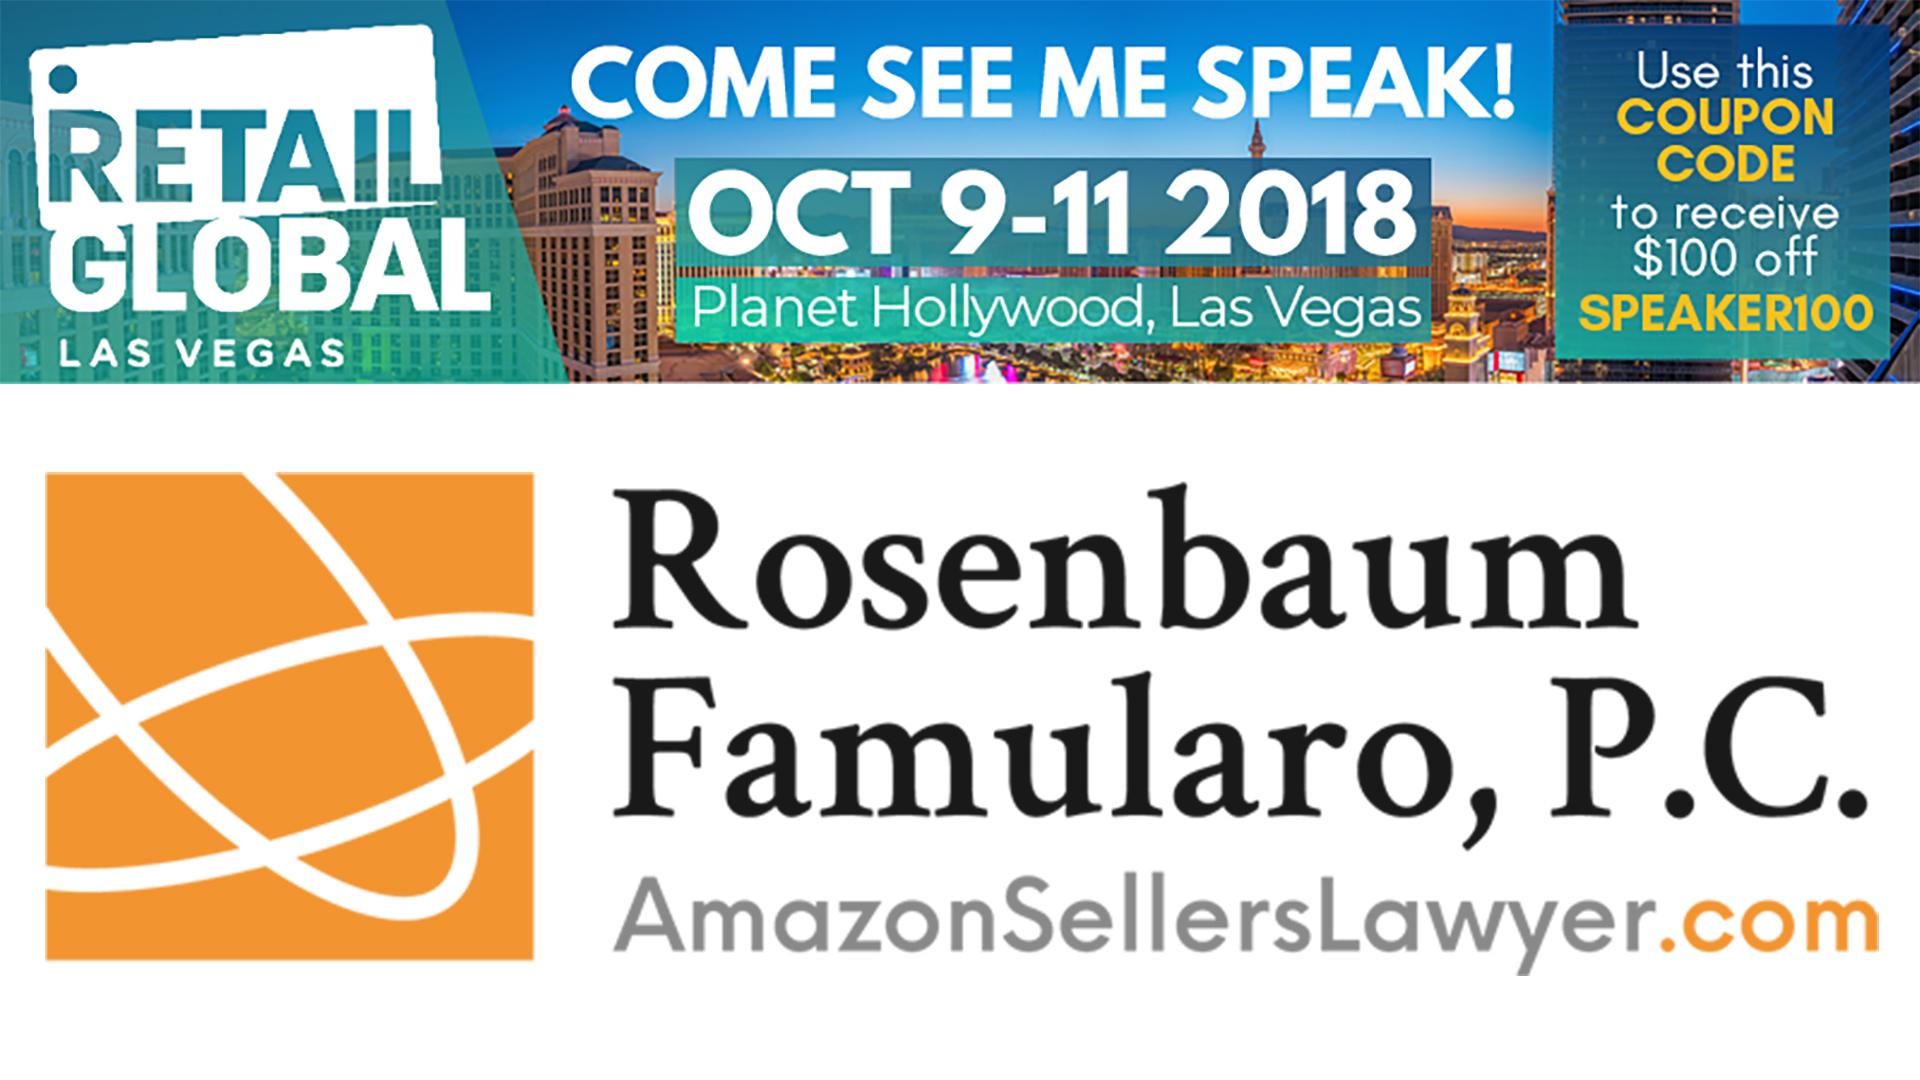 event - Retail Global Las Vegas 2018